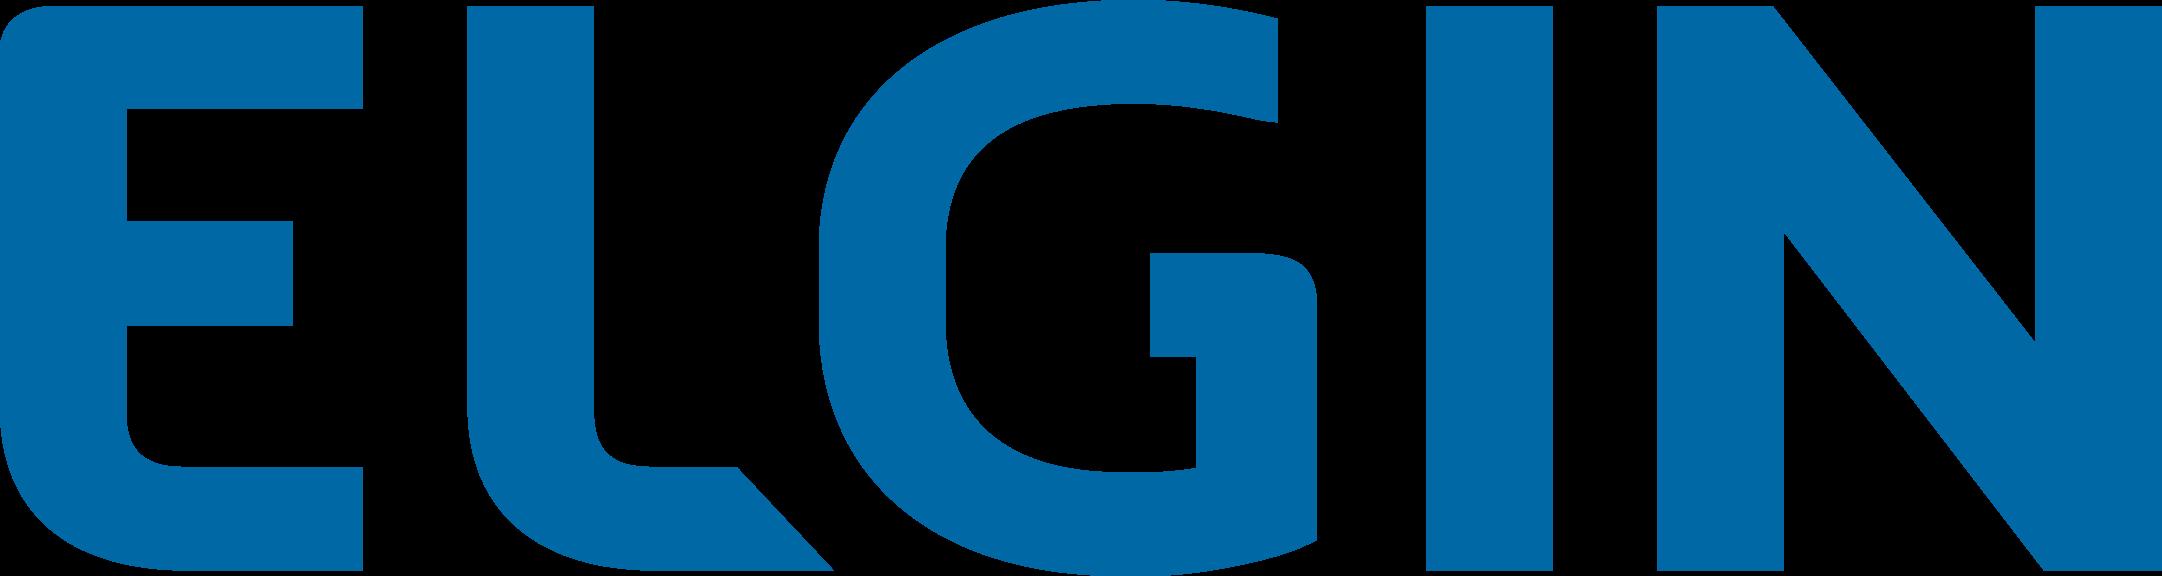 elgin logo 1 1 - Elgin Logo